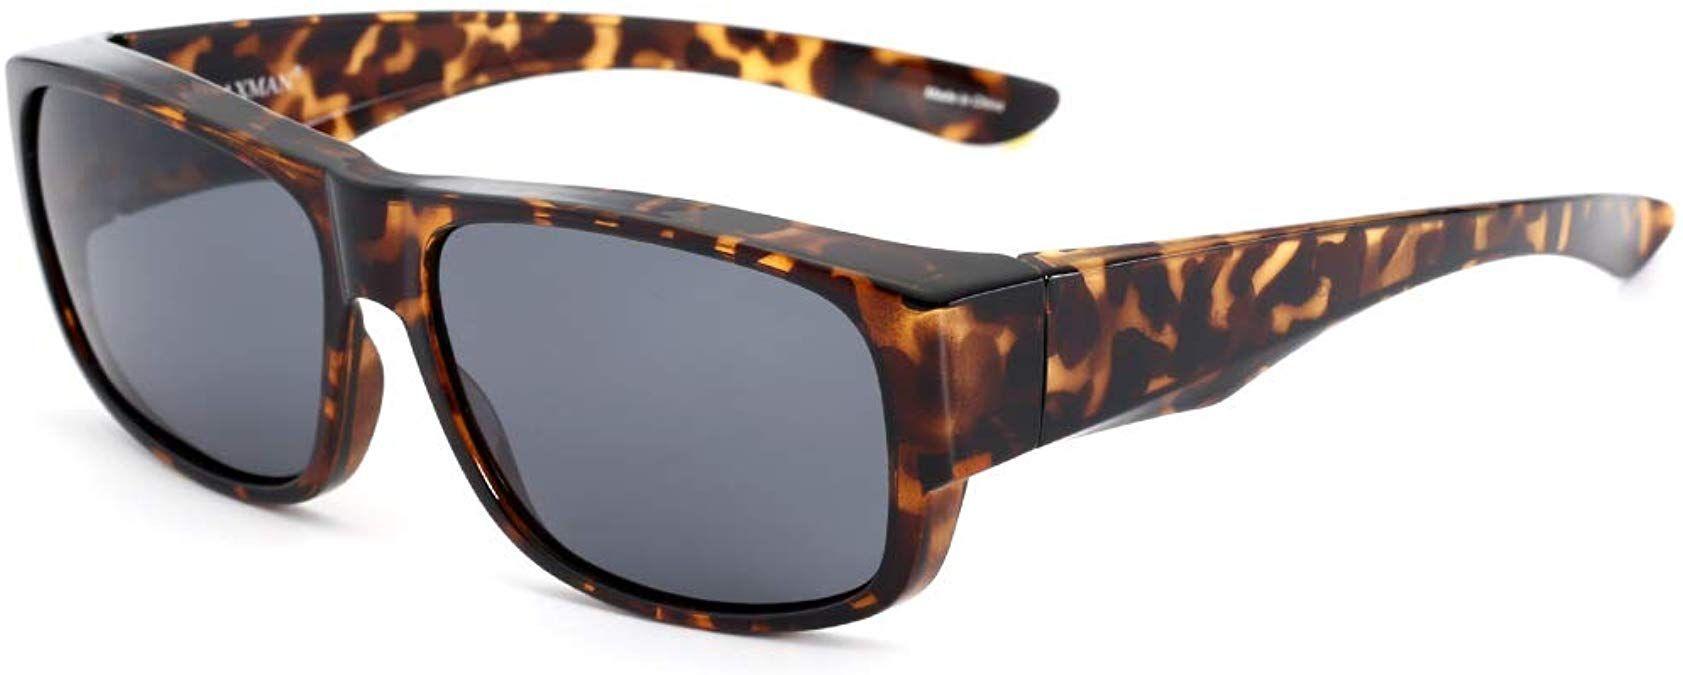 Caxman fits over glasses sunglasses polarized for men